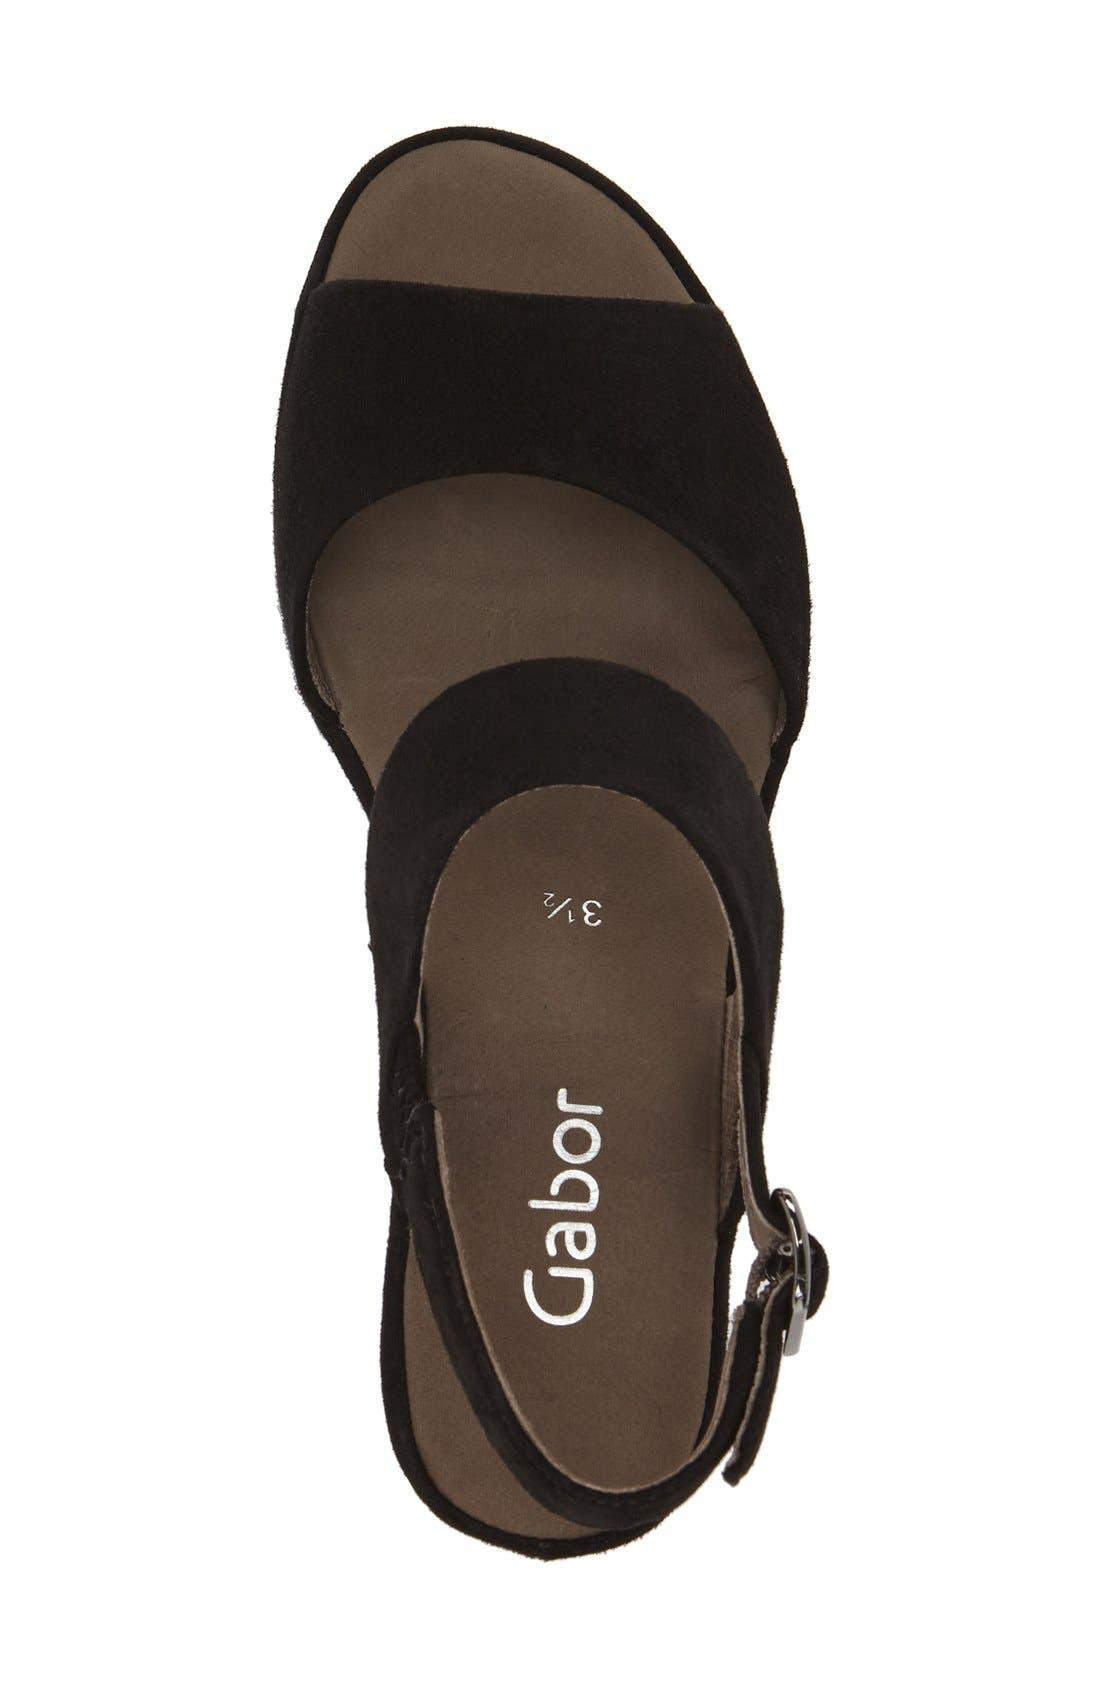 Two-Strap Sandal,                             Alternate thumbnail 5, color,